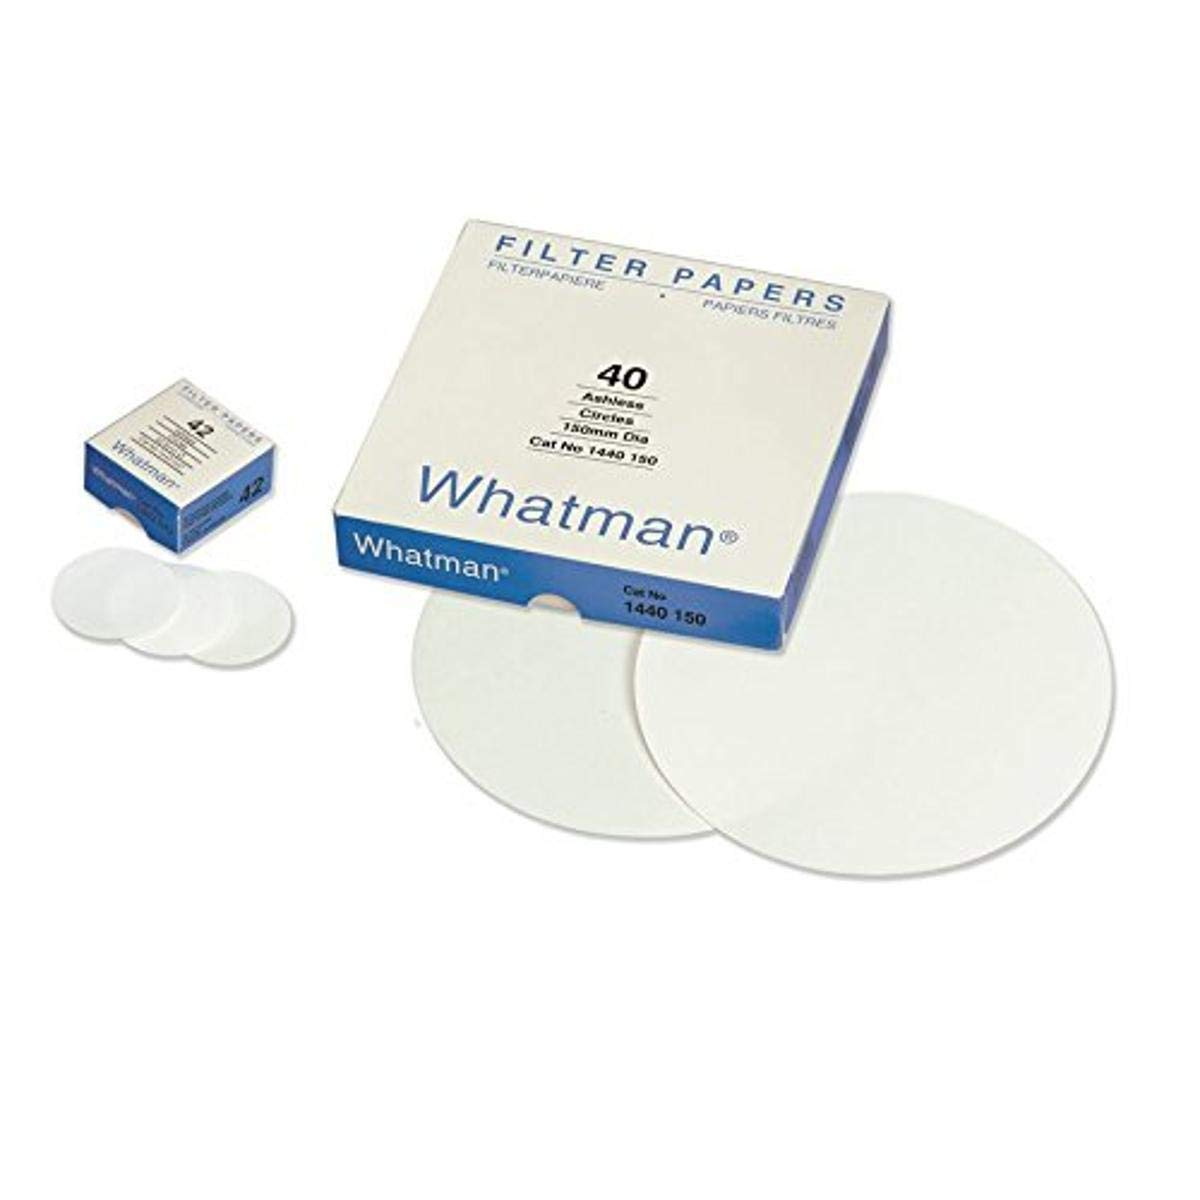 Whatman Max Max 67% OFF 83% OFF 1441-185-DS Cotton Linters Paper Quantitative As Filter